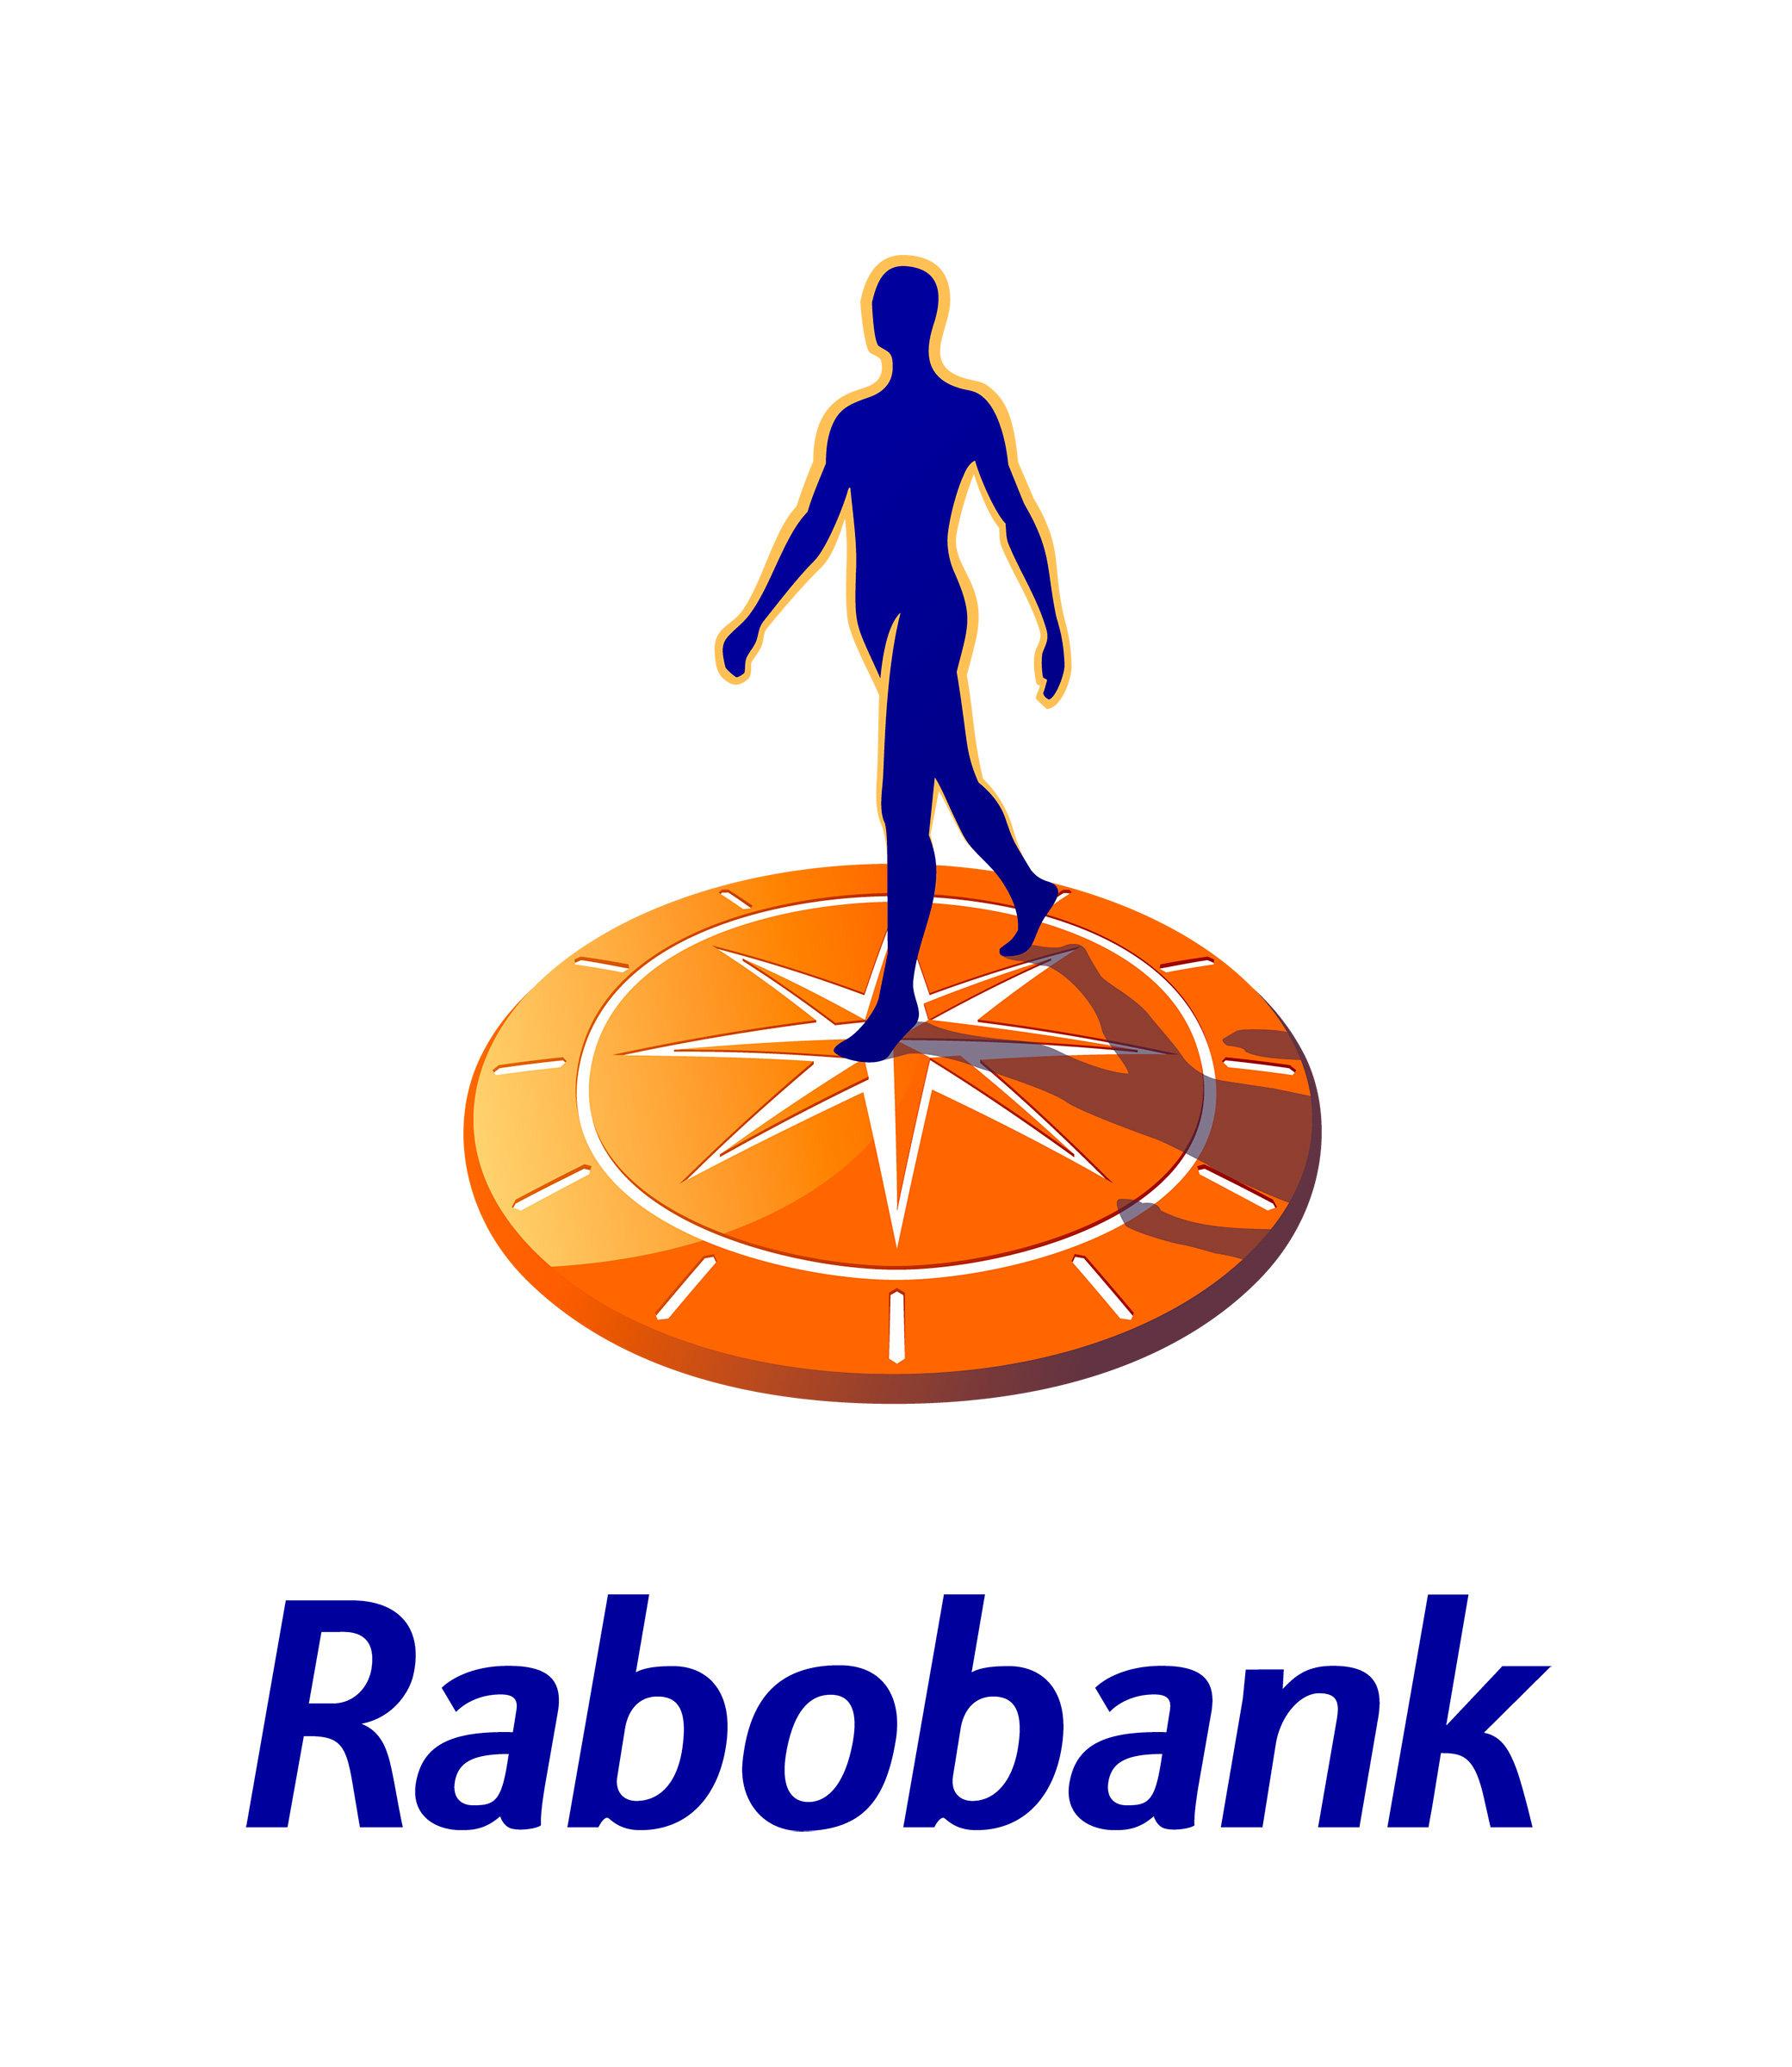 Rabobank-logo.jpg